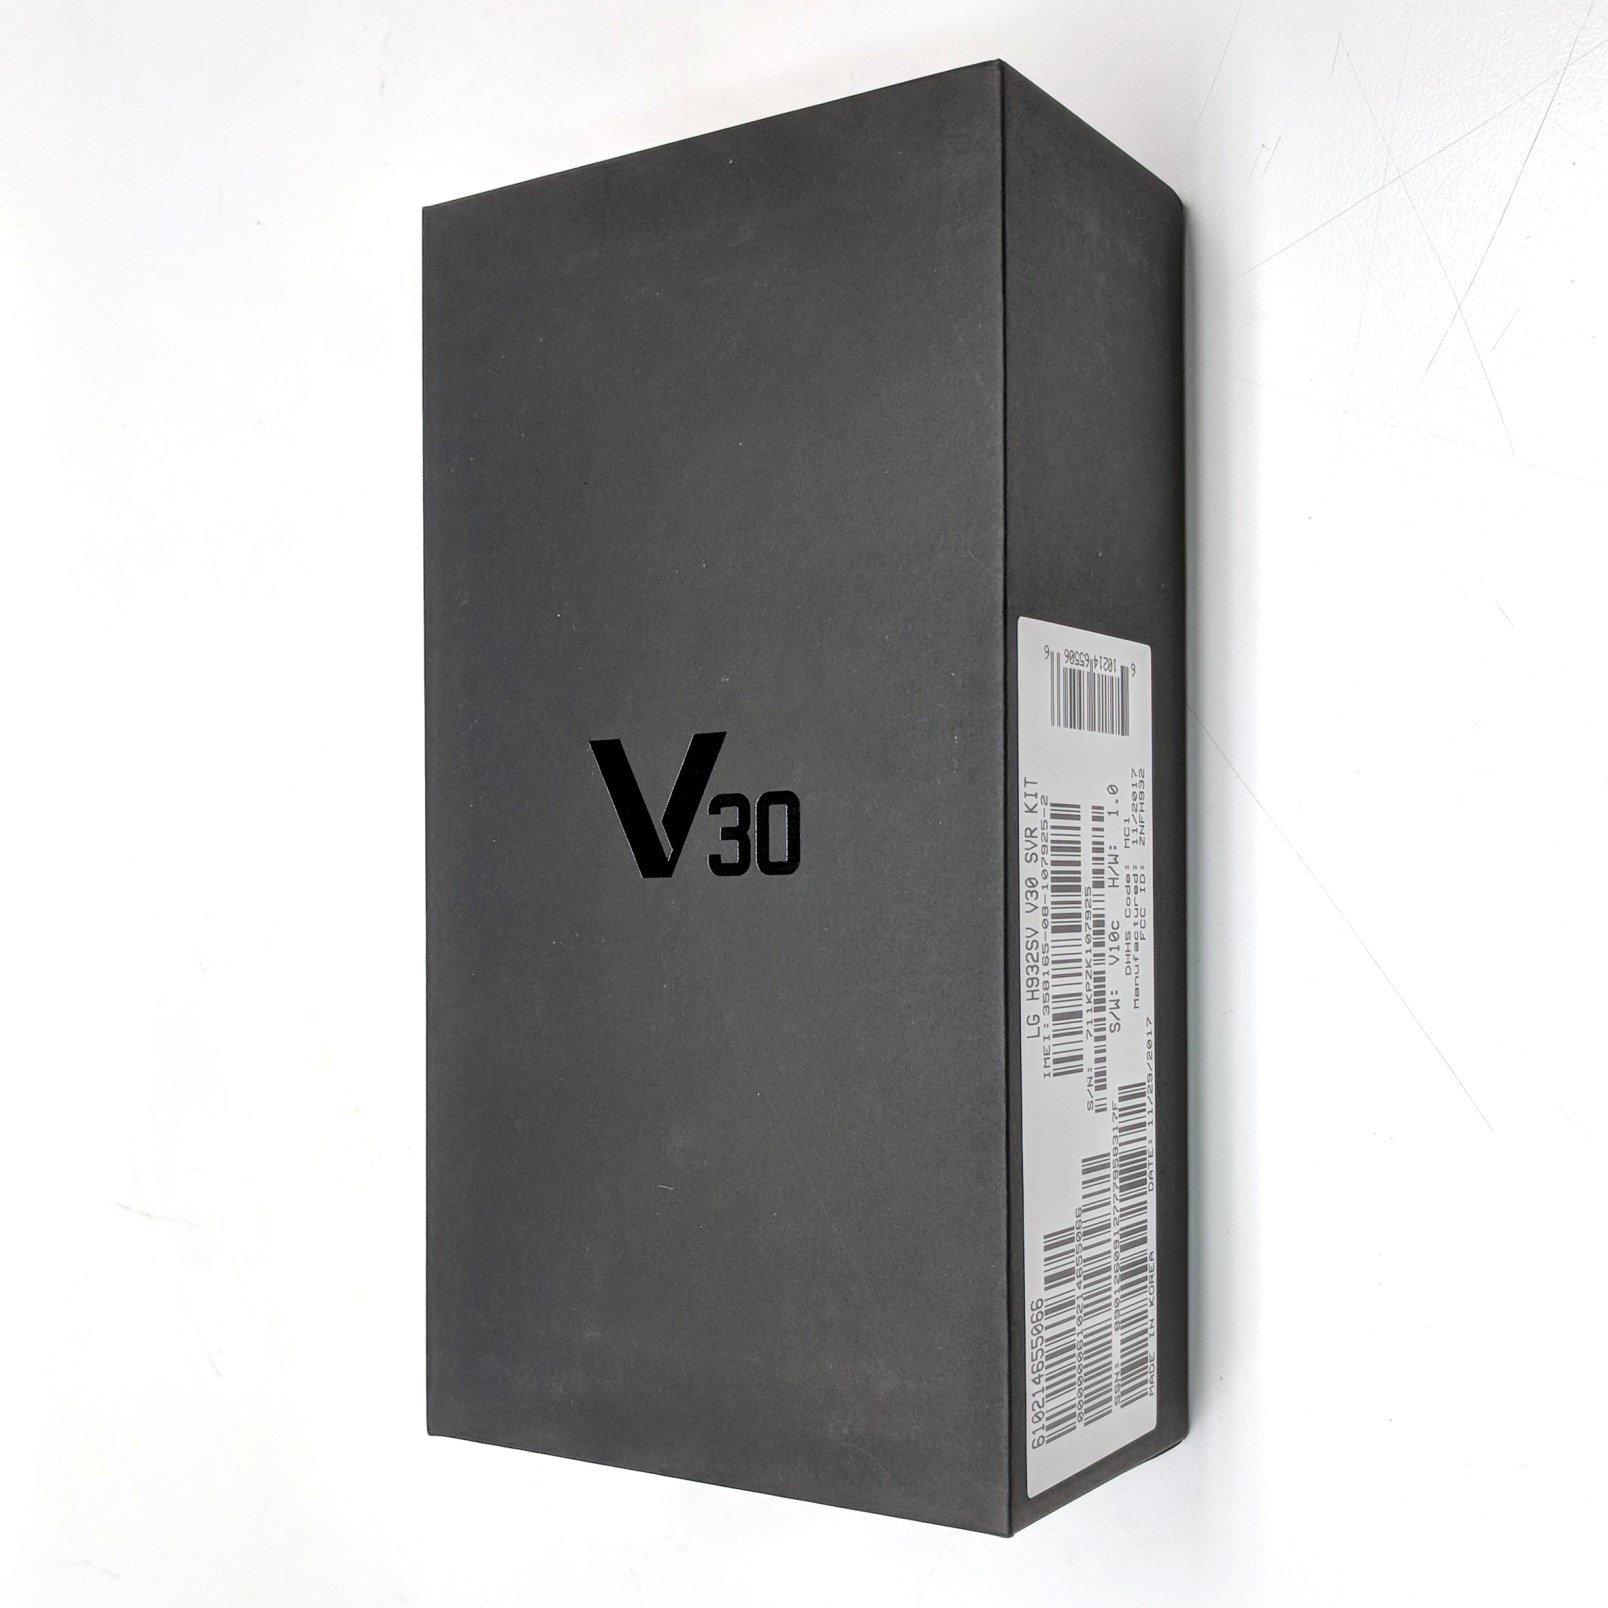 LG V30 H932 Dual Camera 4G LTE 64GB Silver (T-Mobile)